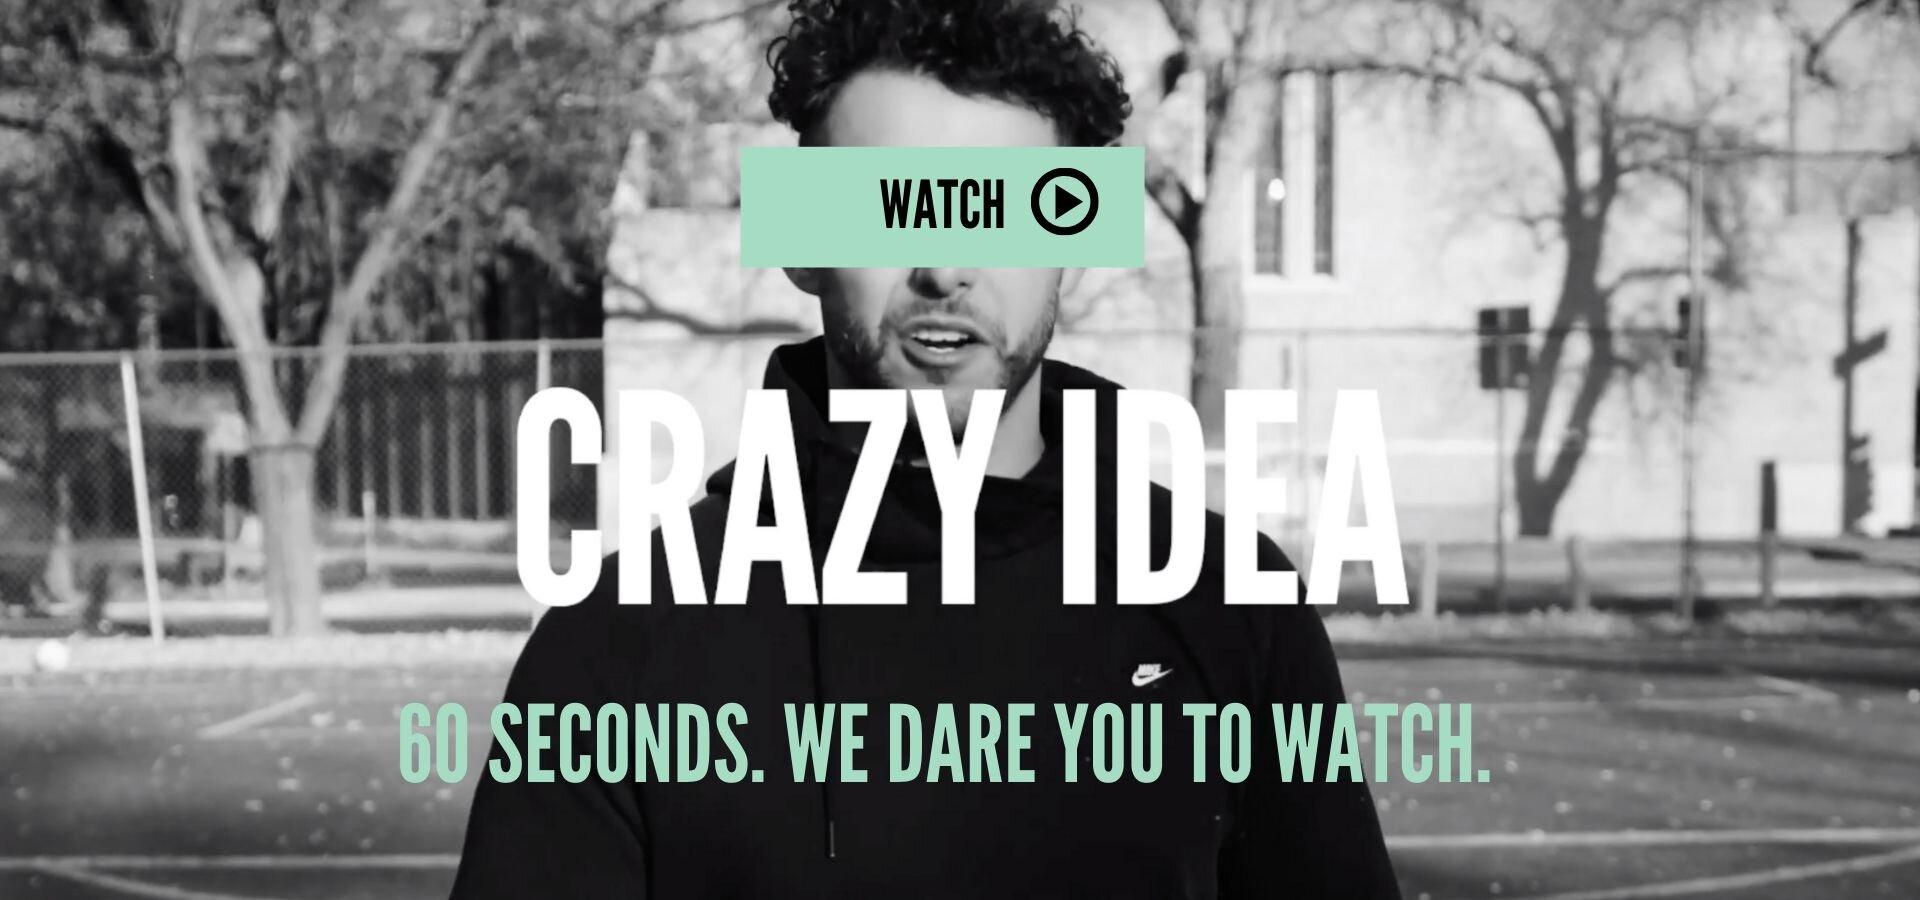 Crazy Idea Video.jpg